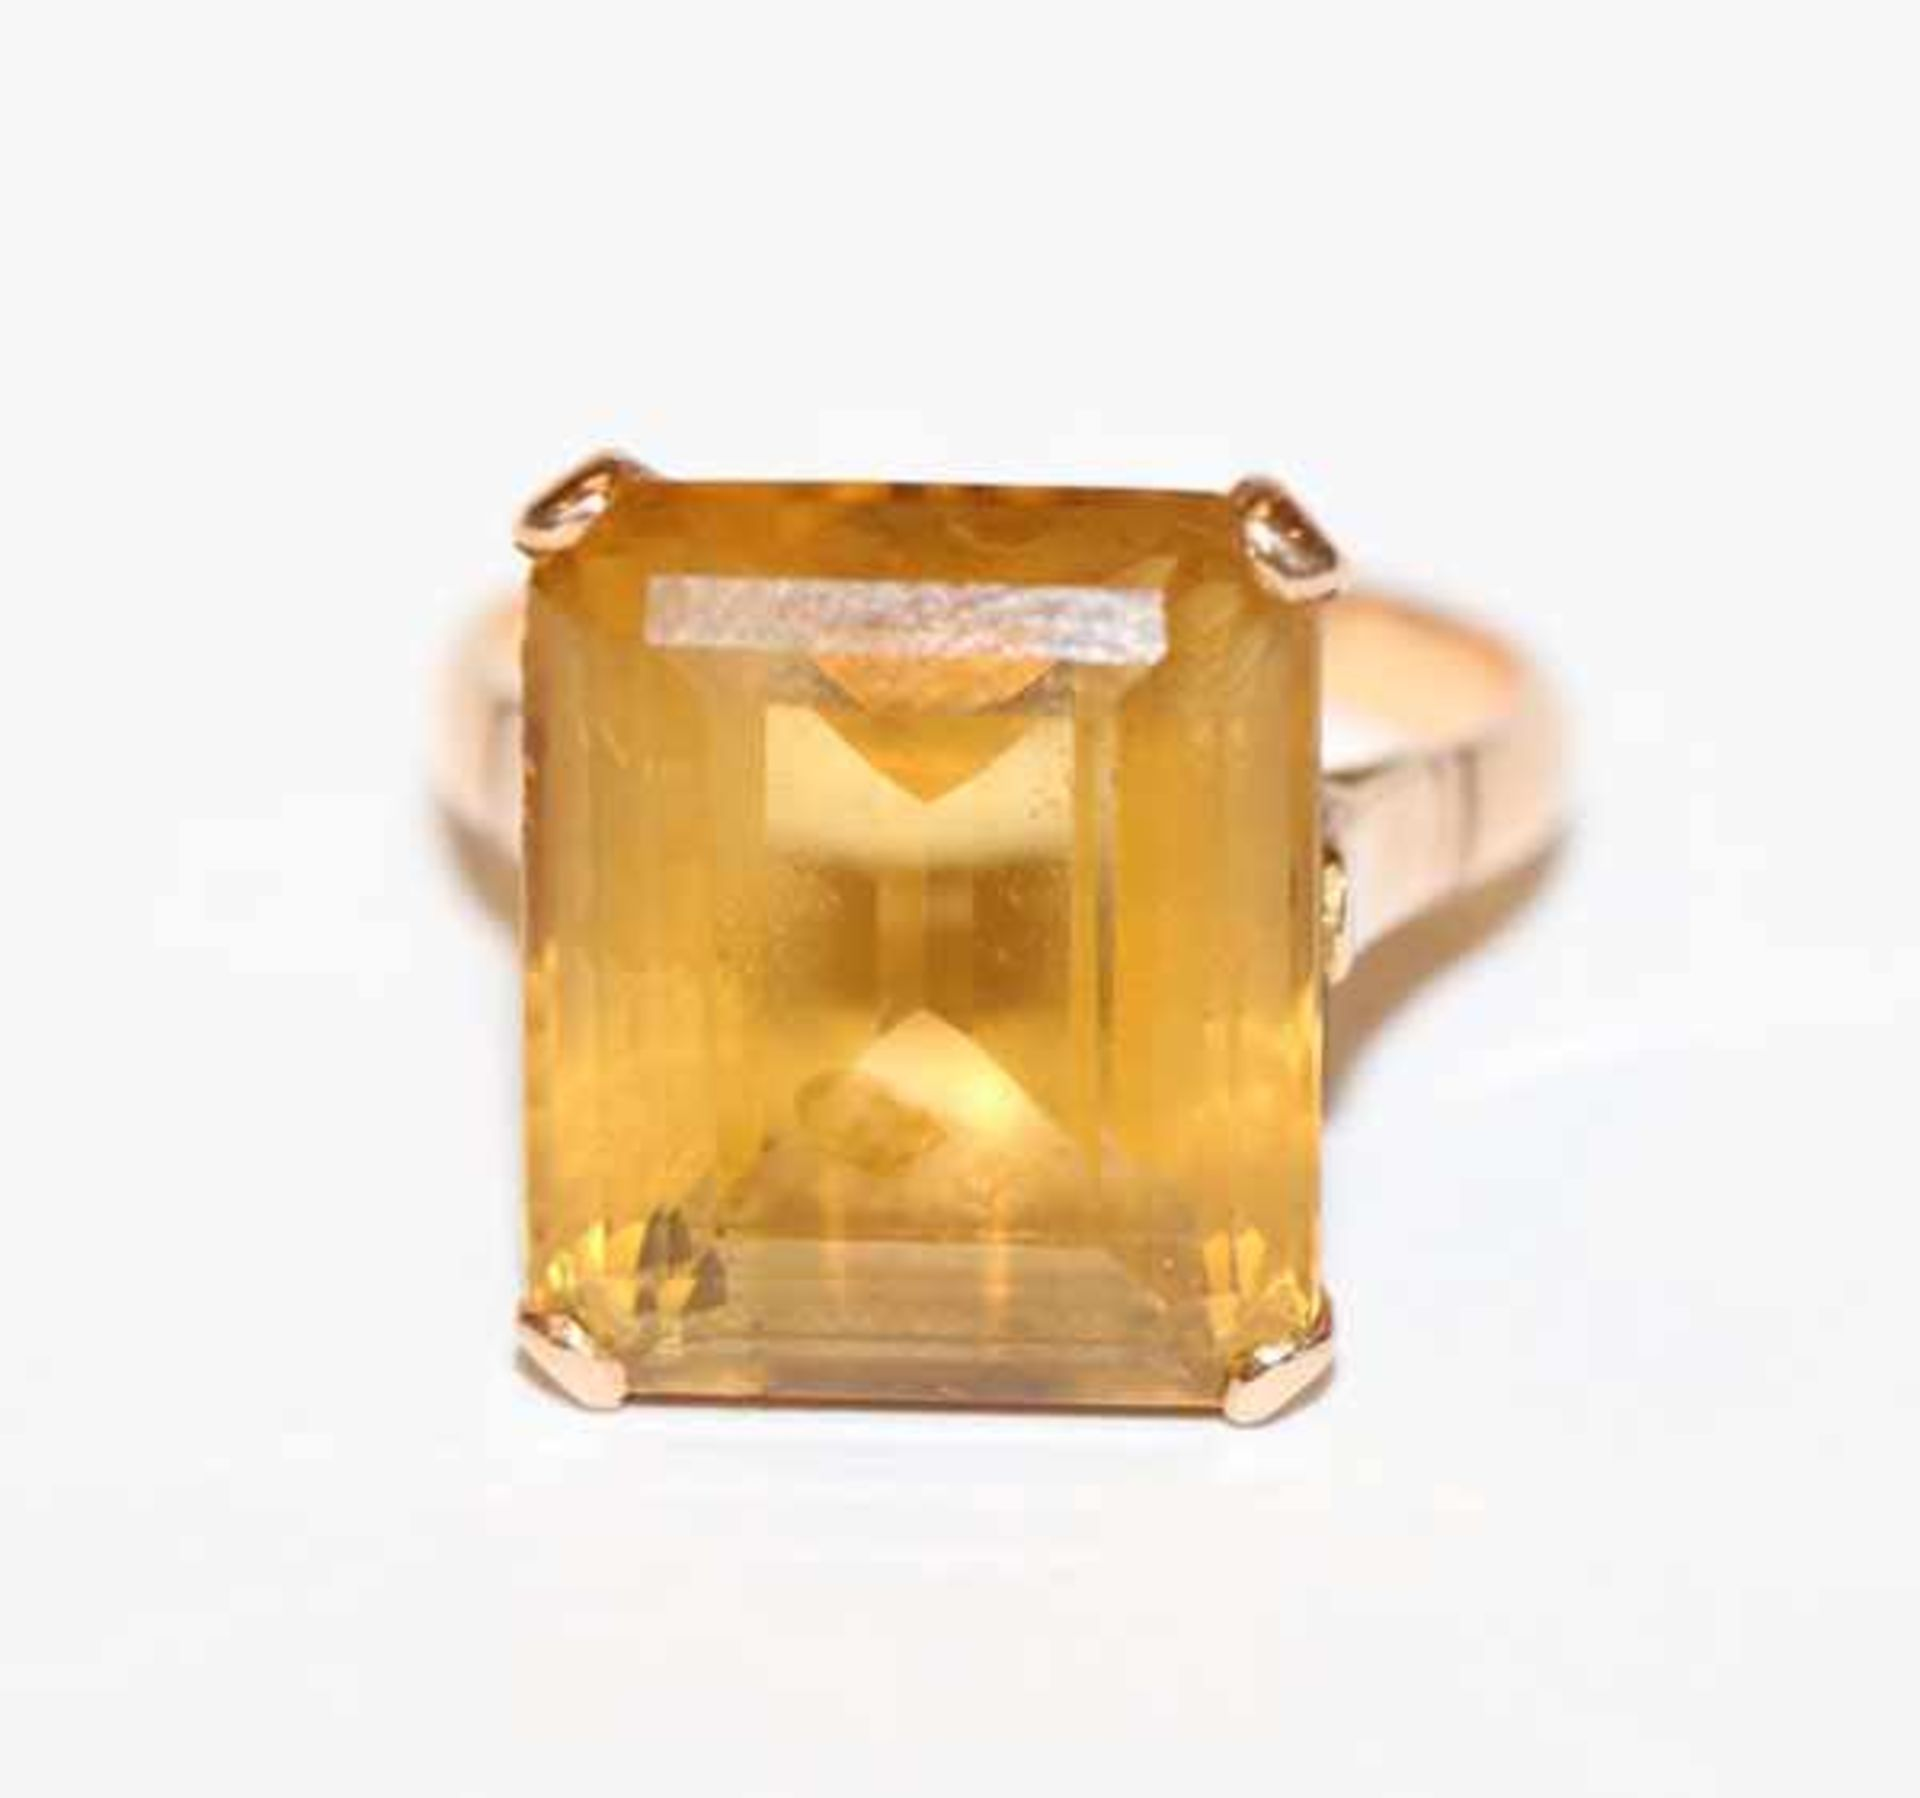 Los 52 - 14 k Gelbgold (geprüft) Ring mit Topas, Gr. 52, 5,6 gr.